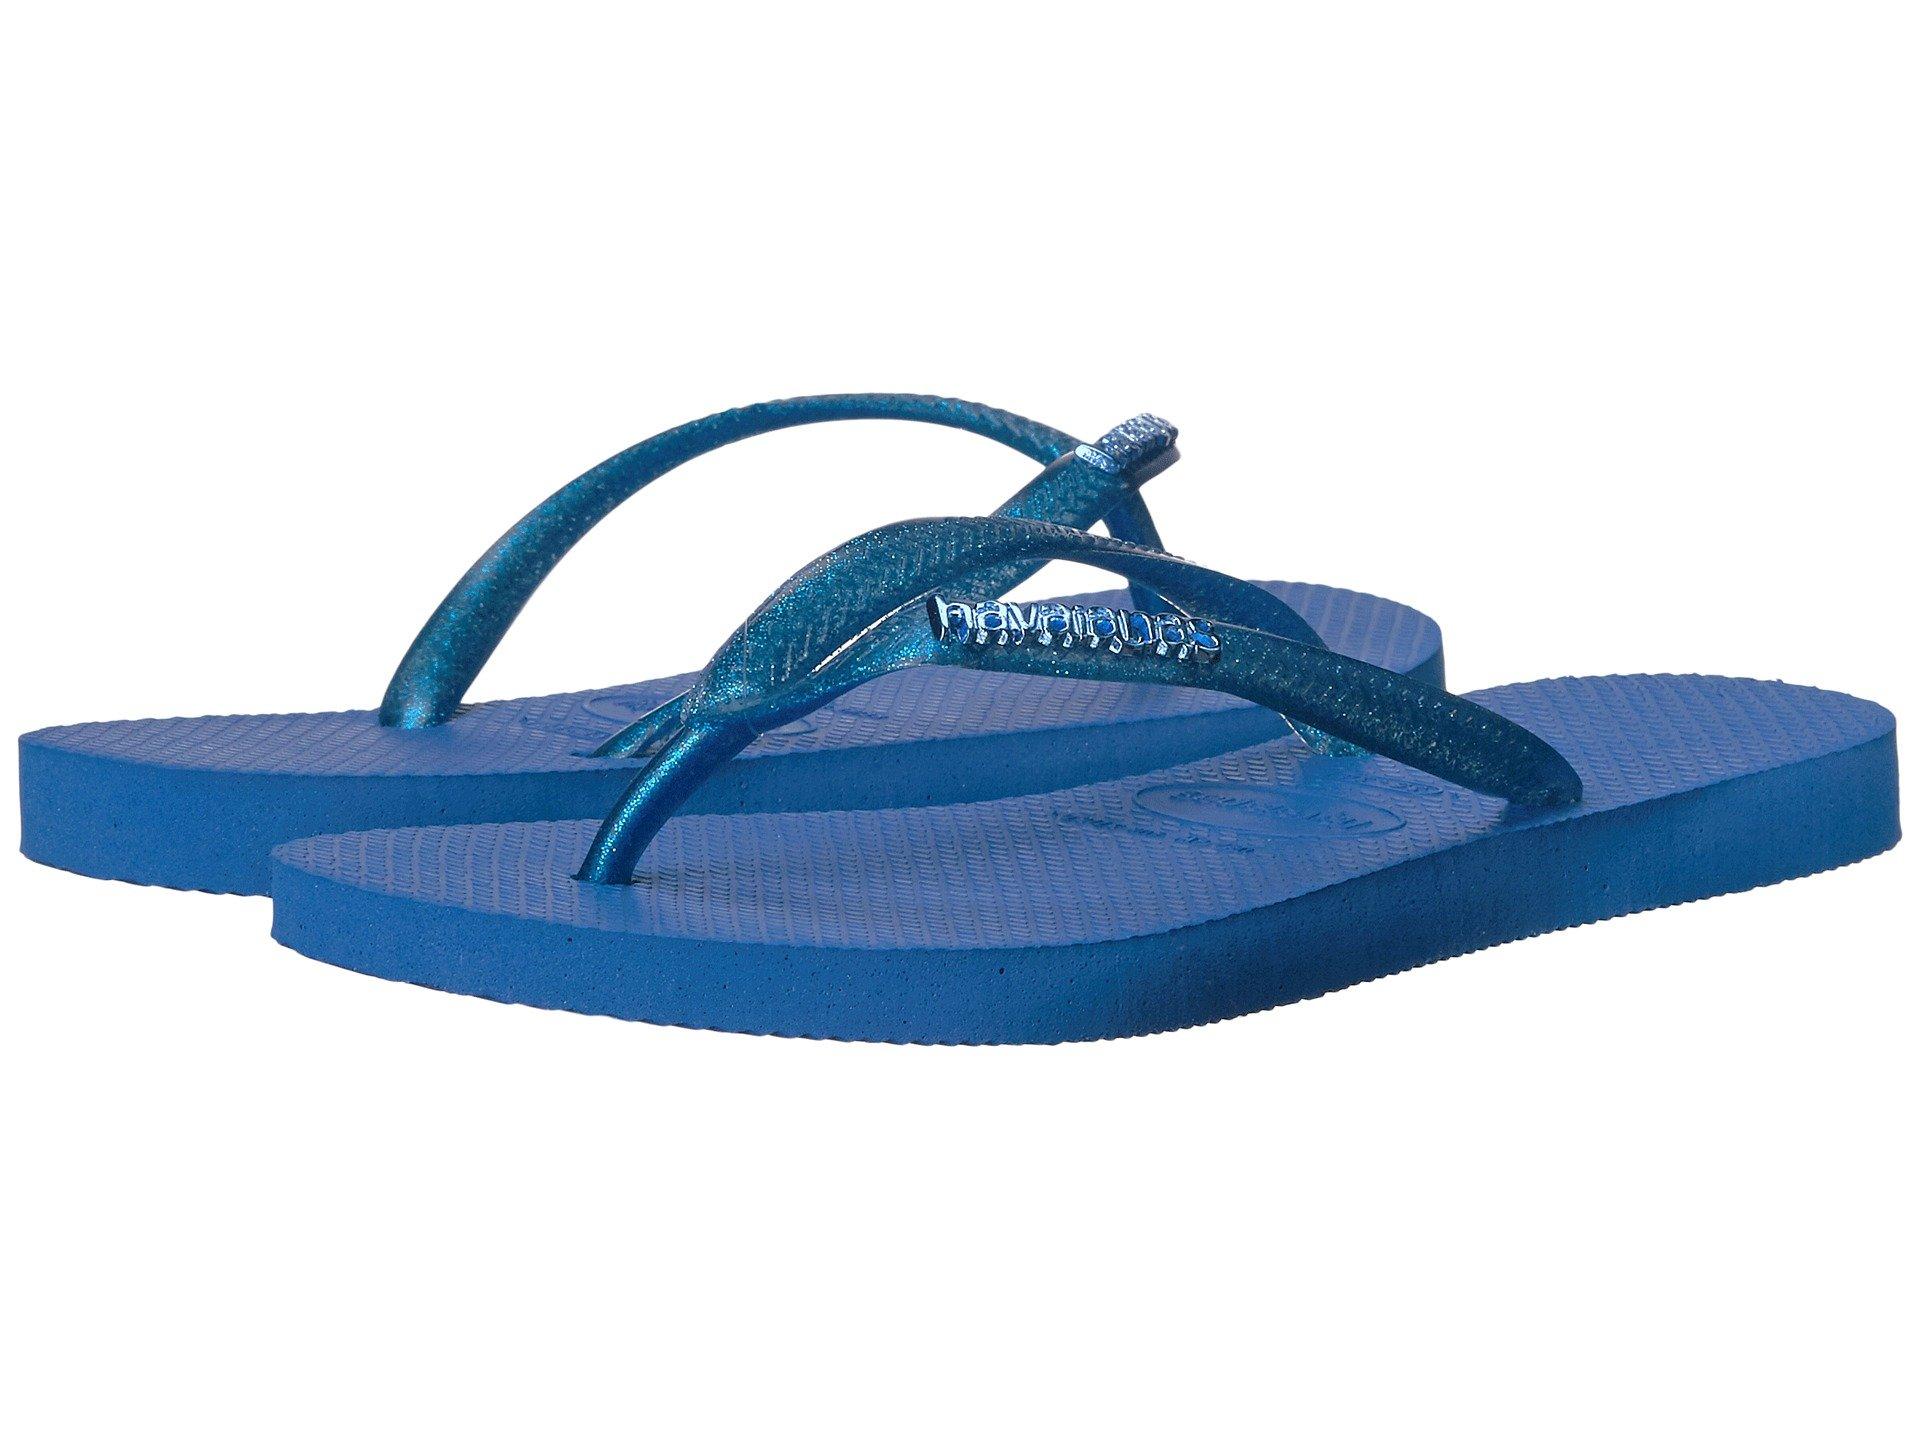 80c8d135136f70 Havaianas Slim Logo Metallic Flip Flops In Blue Star